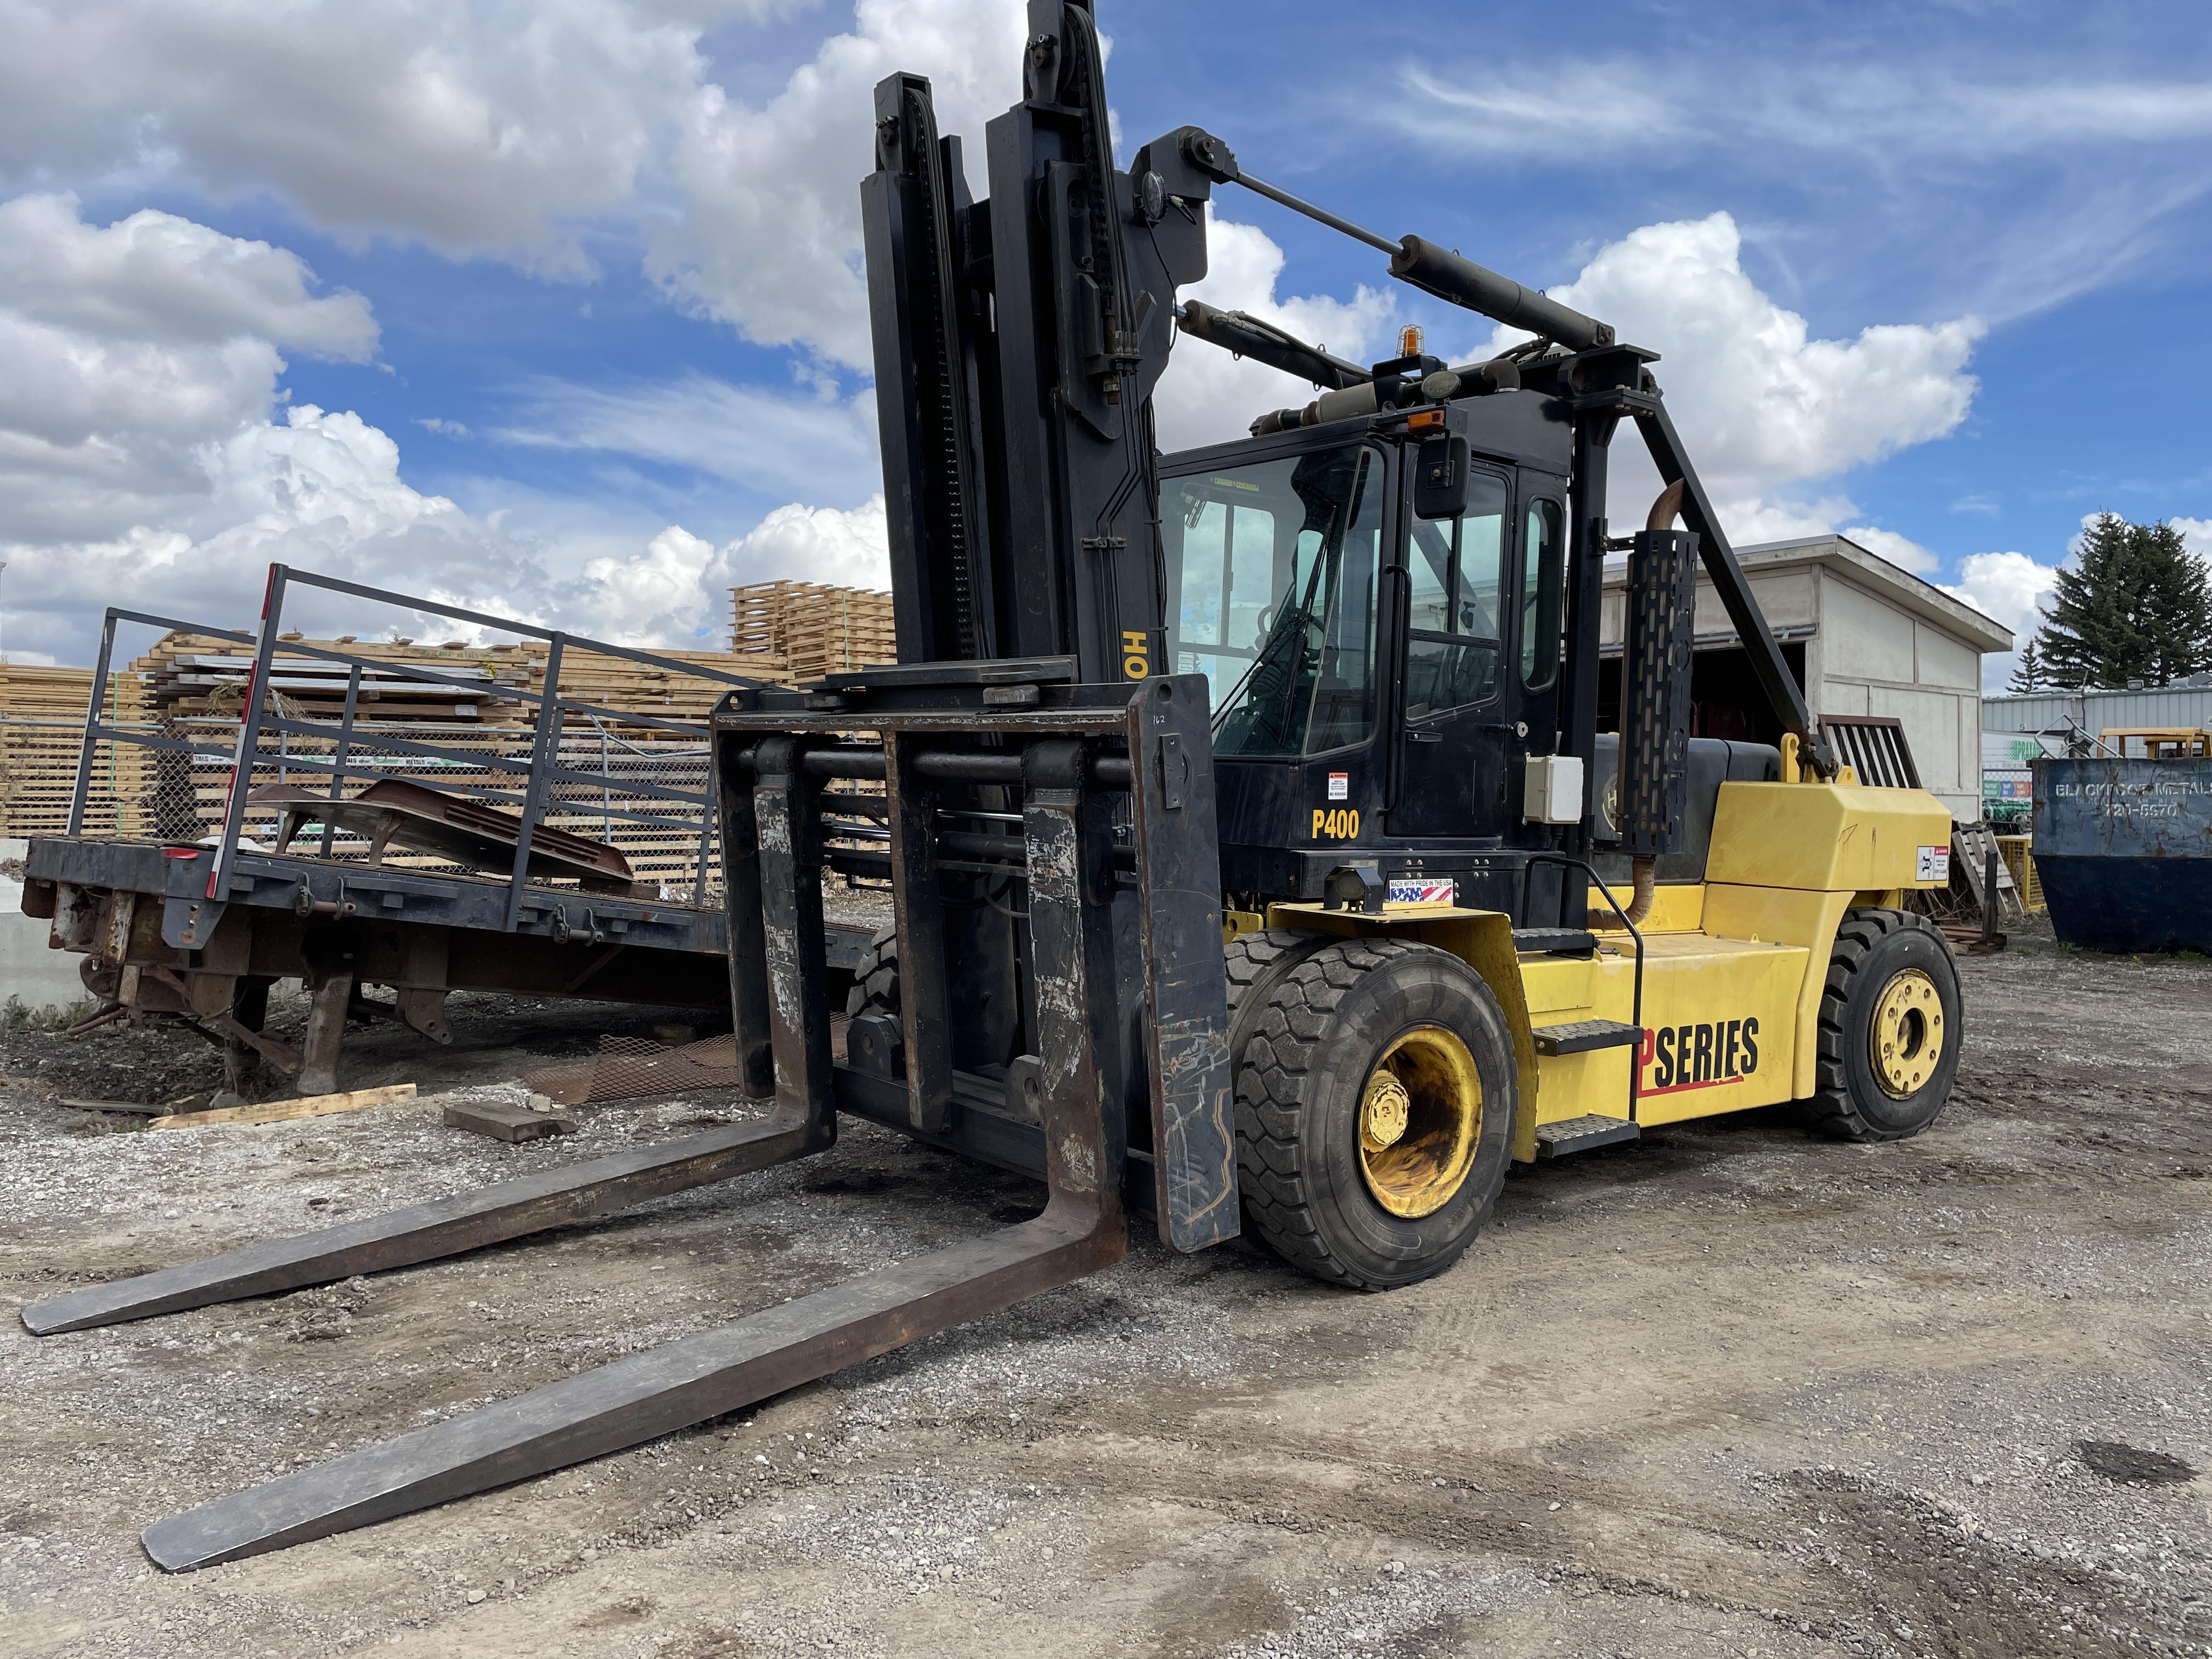 Used, 2015, Hoist, P400@48, Forklifts / Lift Trucks